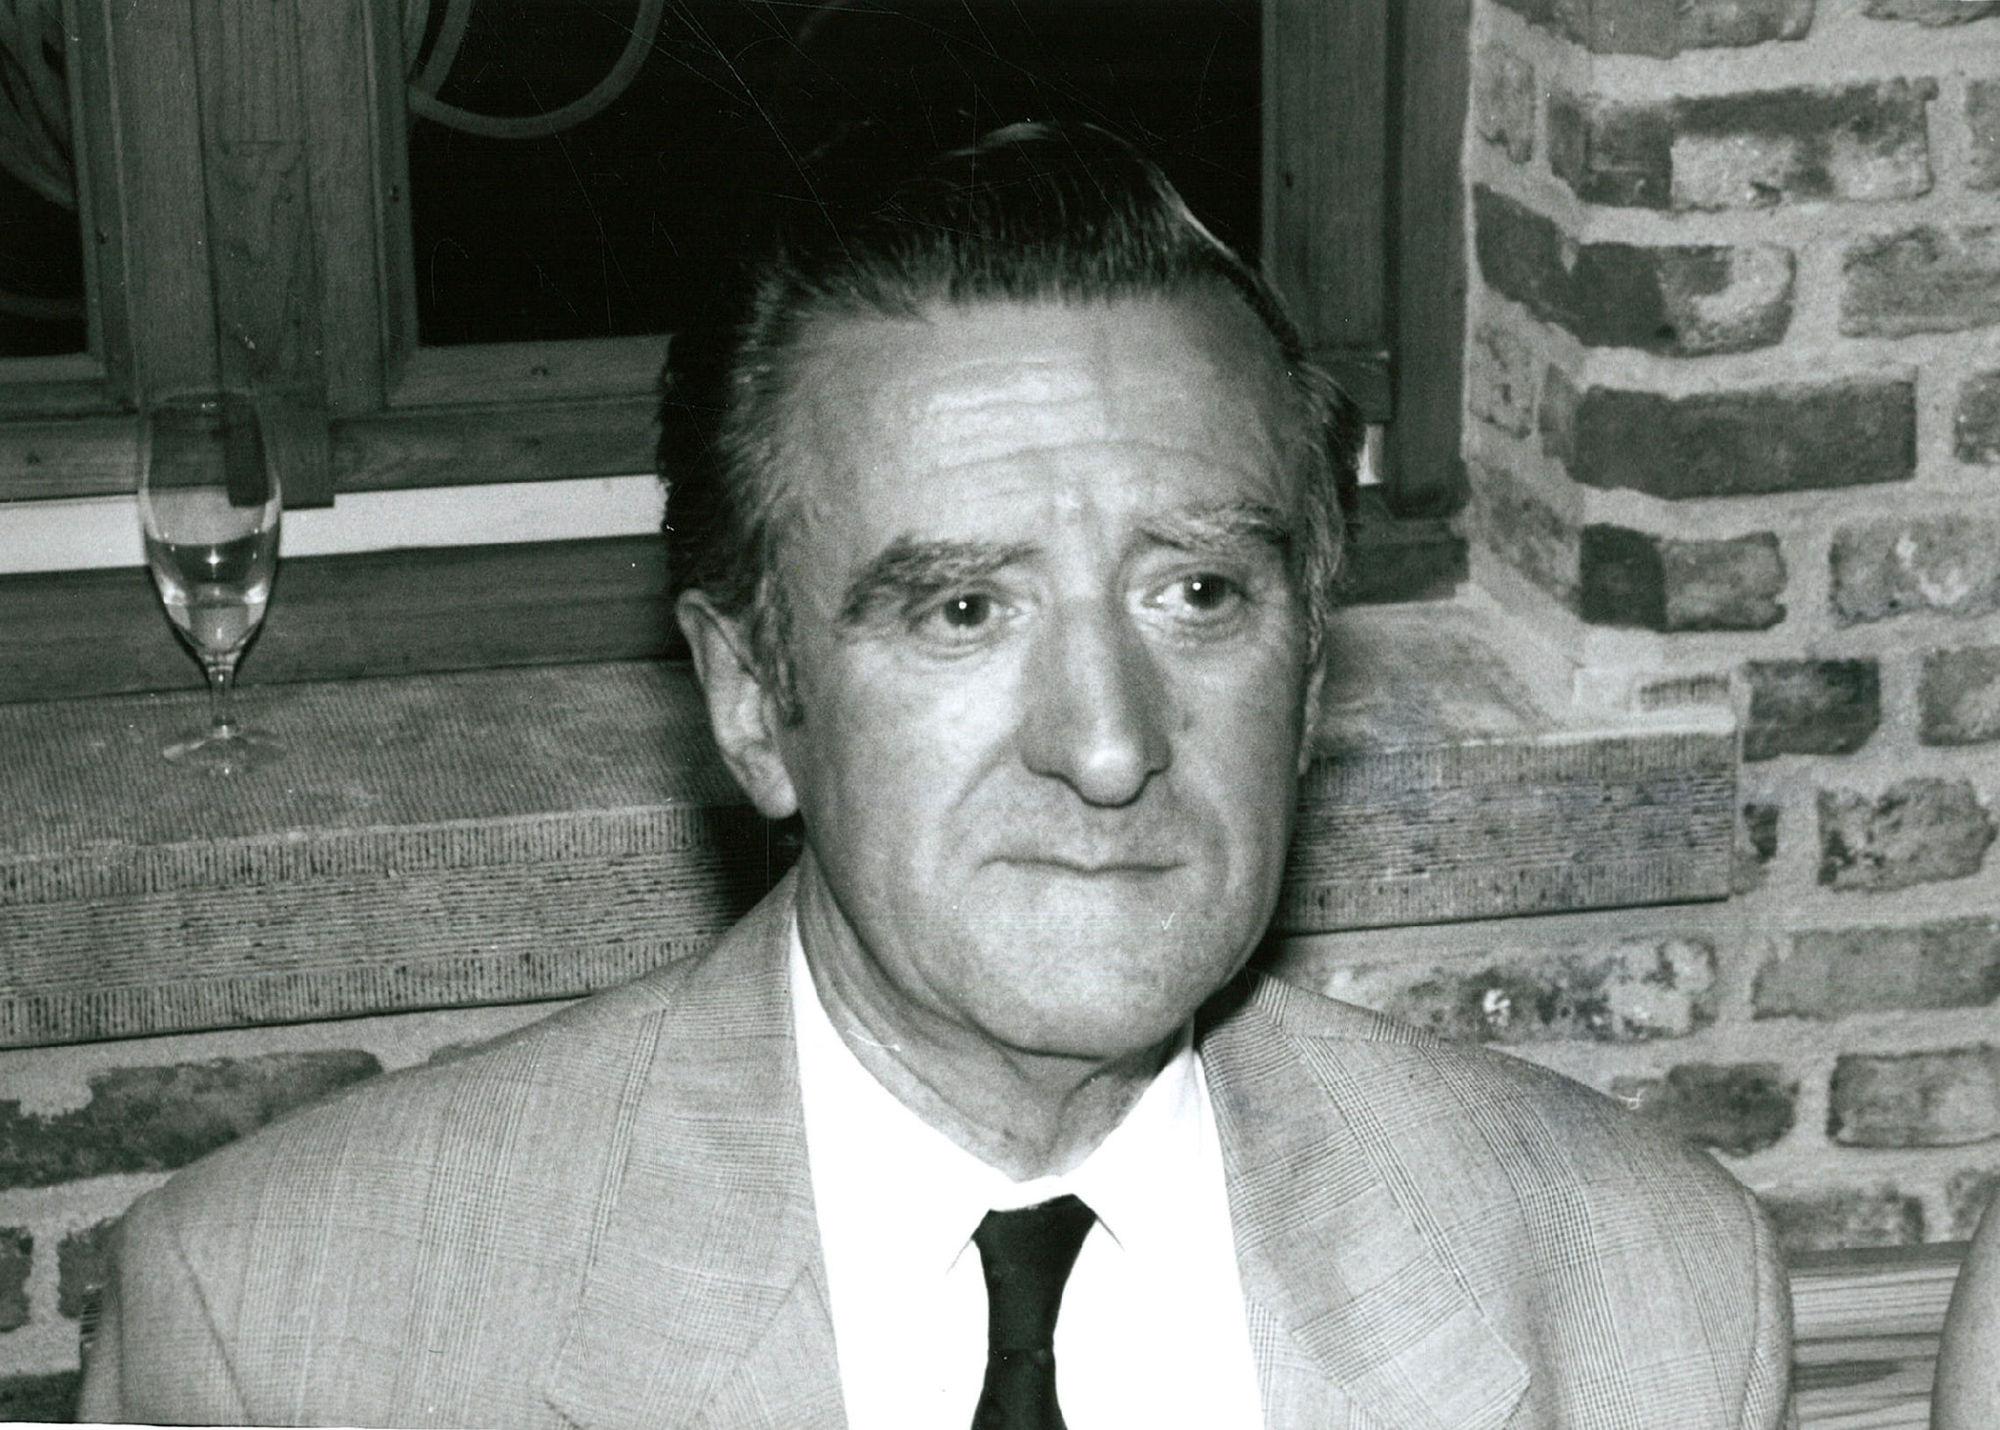 Paul Debrabandere